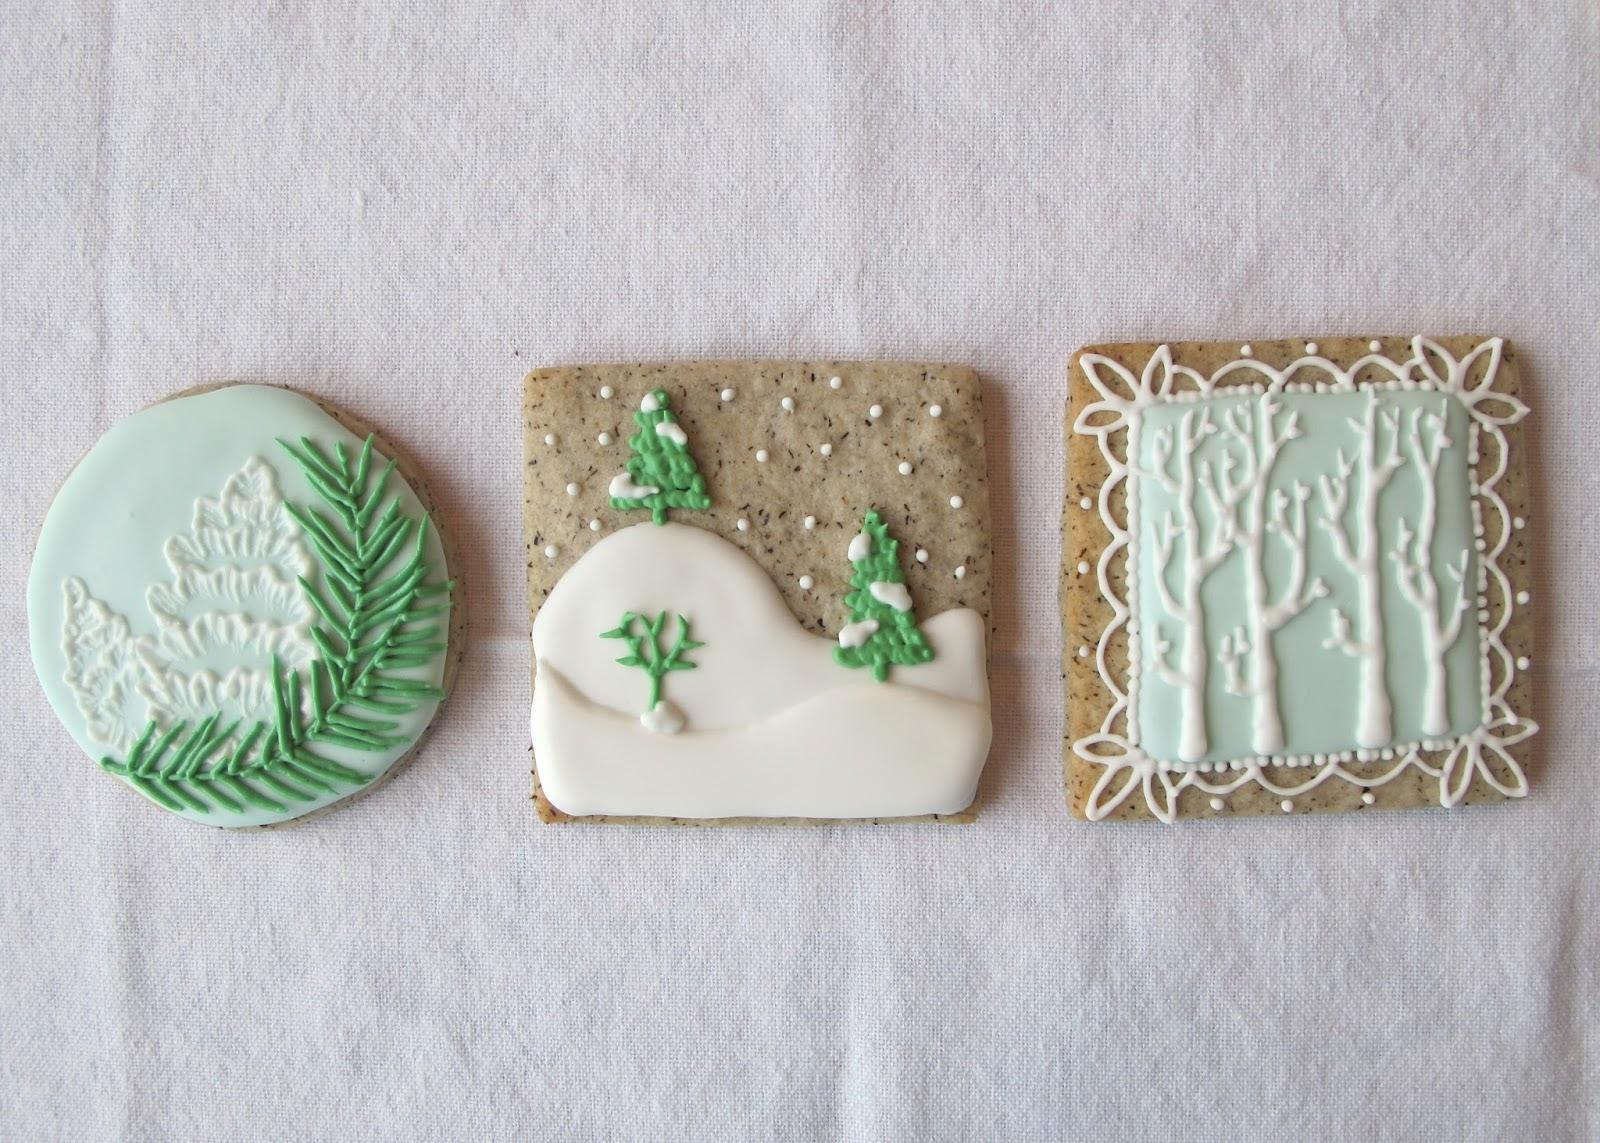 Fine Motor Skills Winter Cookies Sugar Cookie Royal Icing Recipes